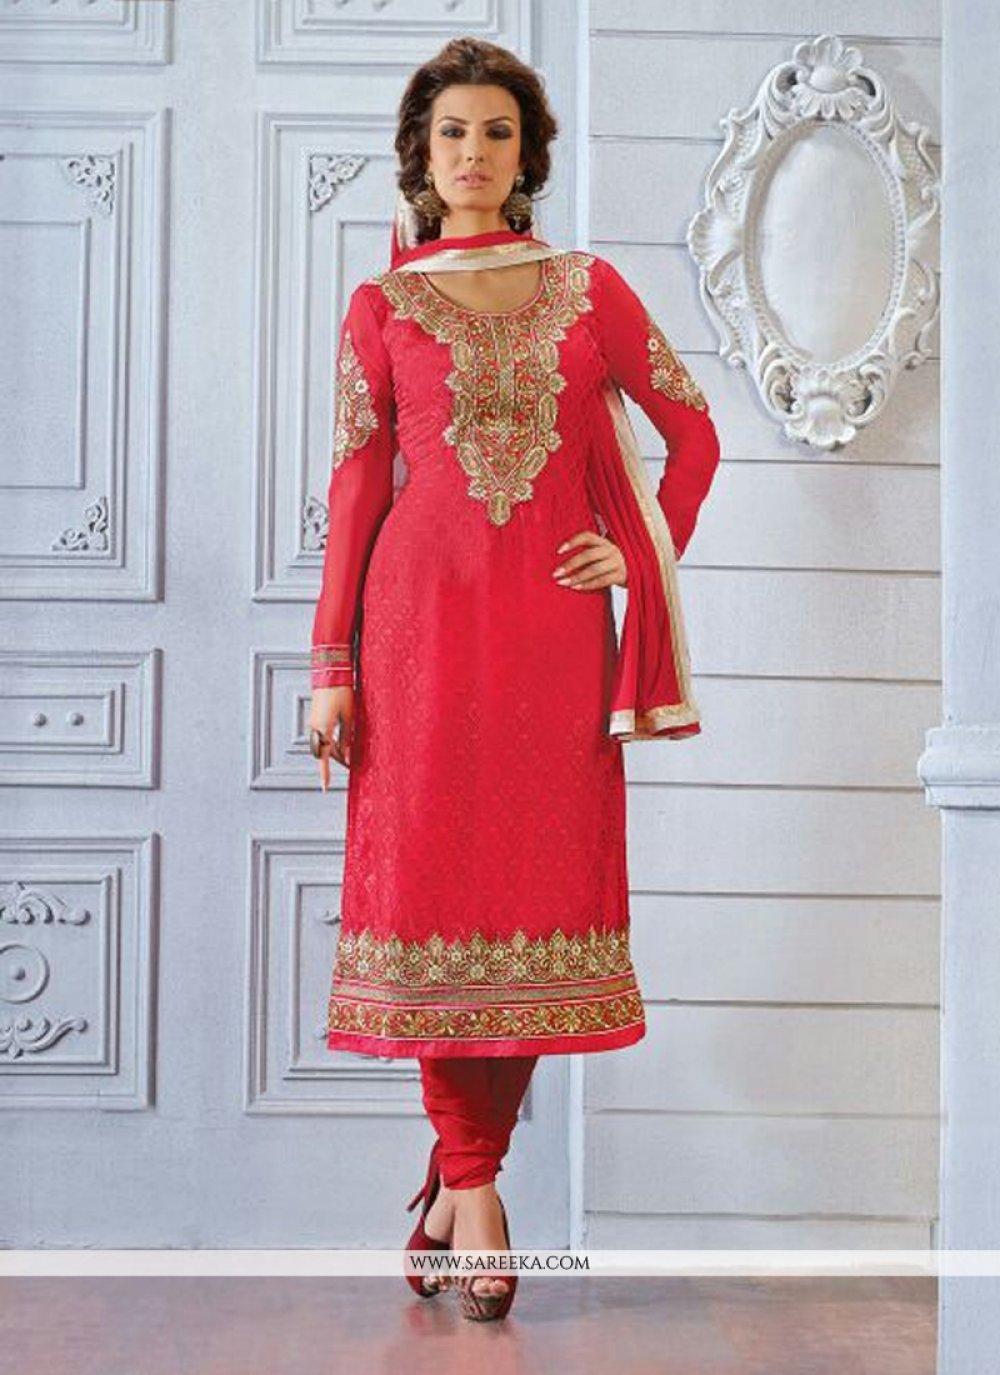 Red Brasso Churidar Salwar Kameez